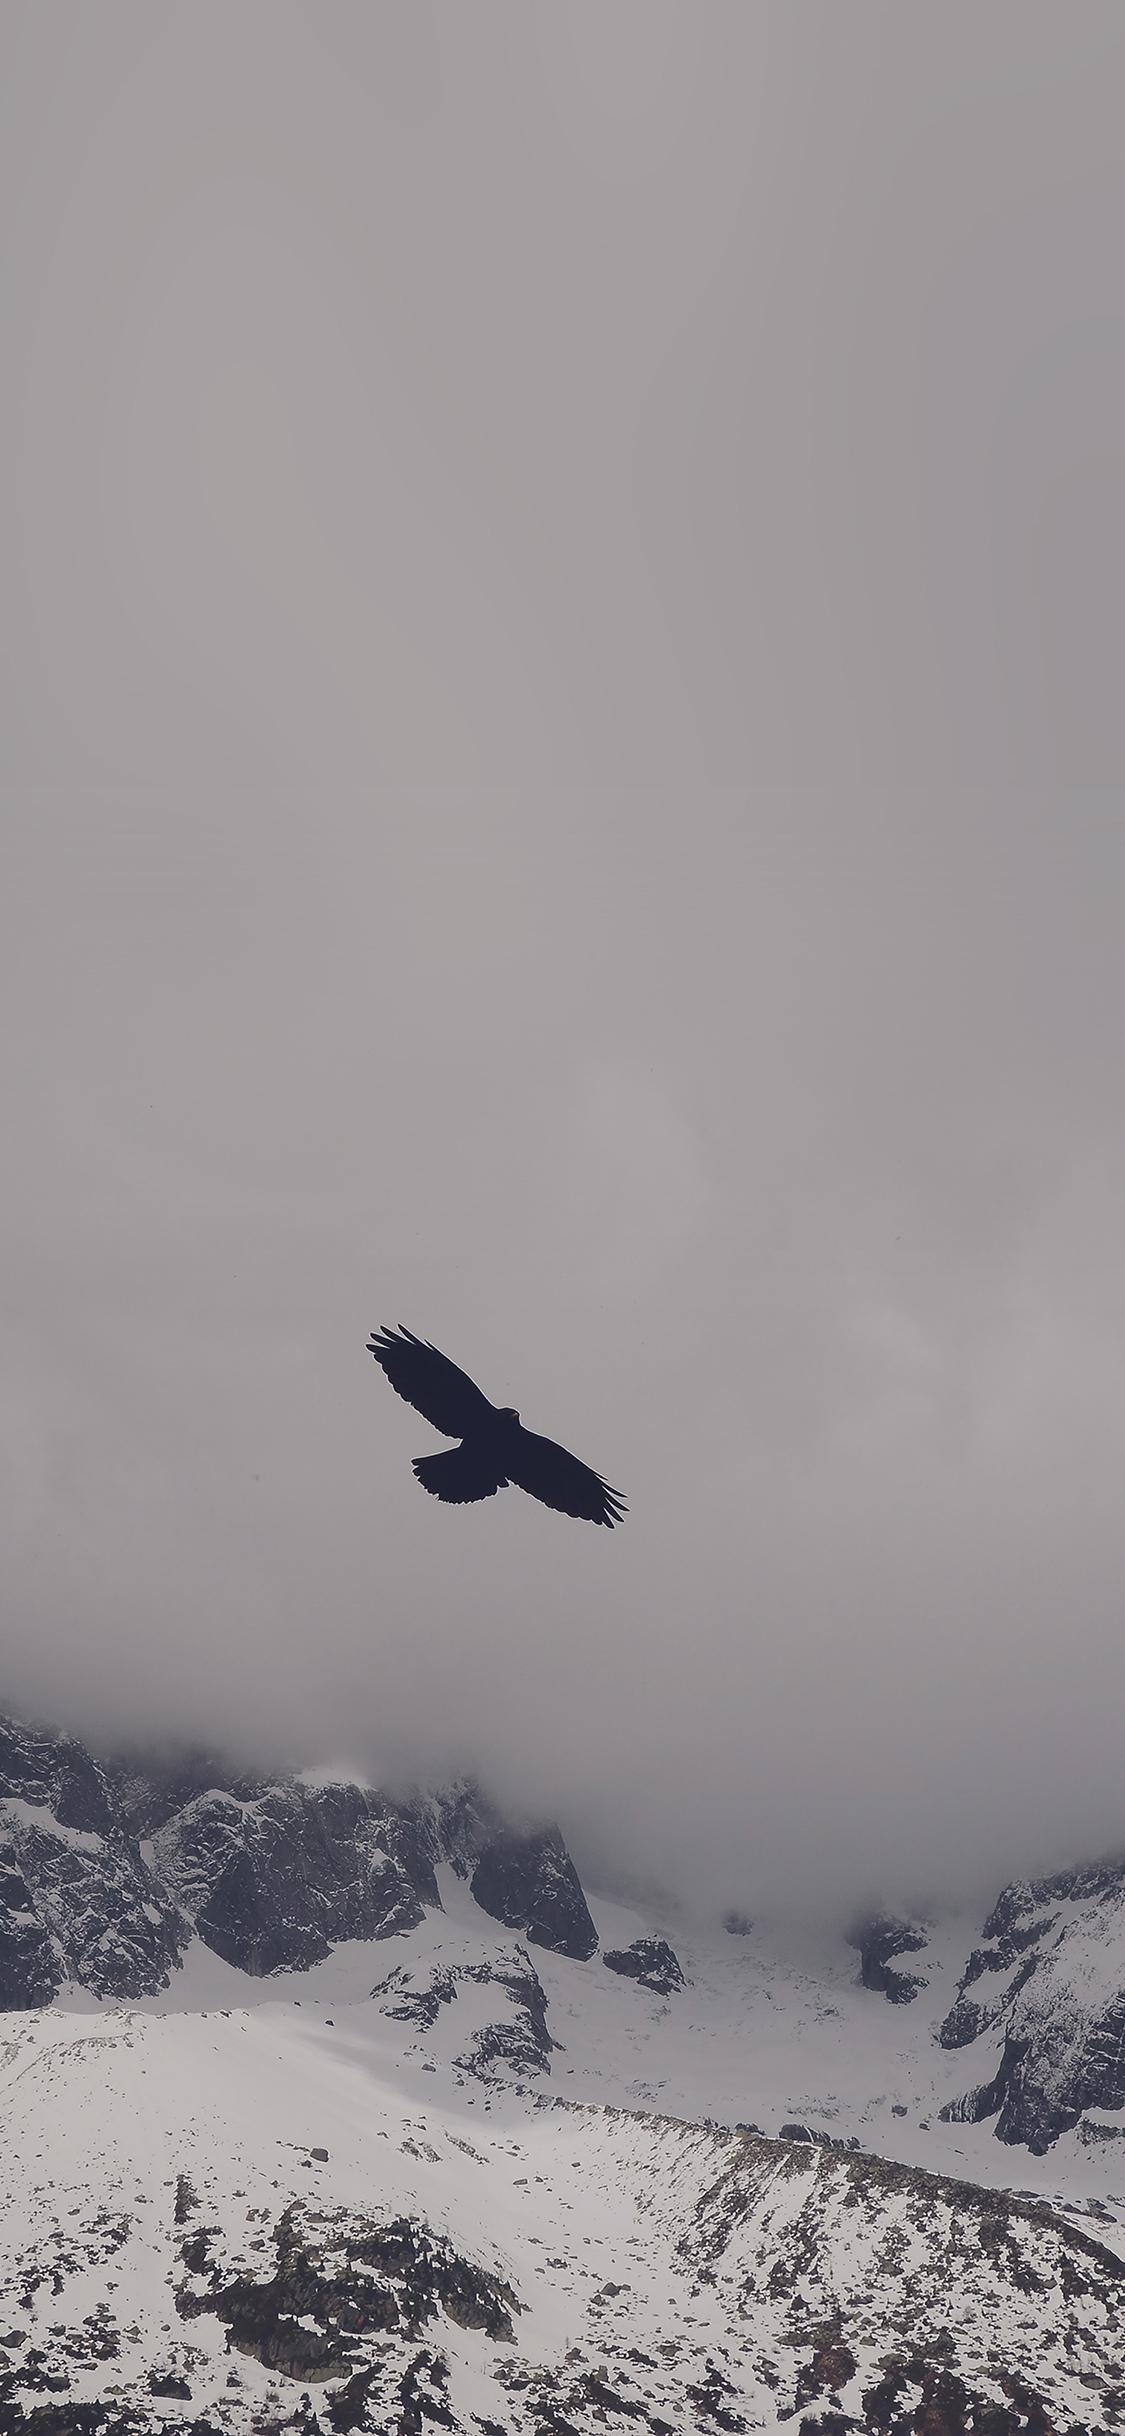 Iphonexpapers Mn79 Julia Revitt Eagle Blue Mountain Winter Snow Nature Animal